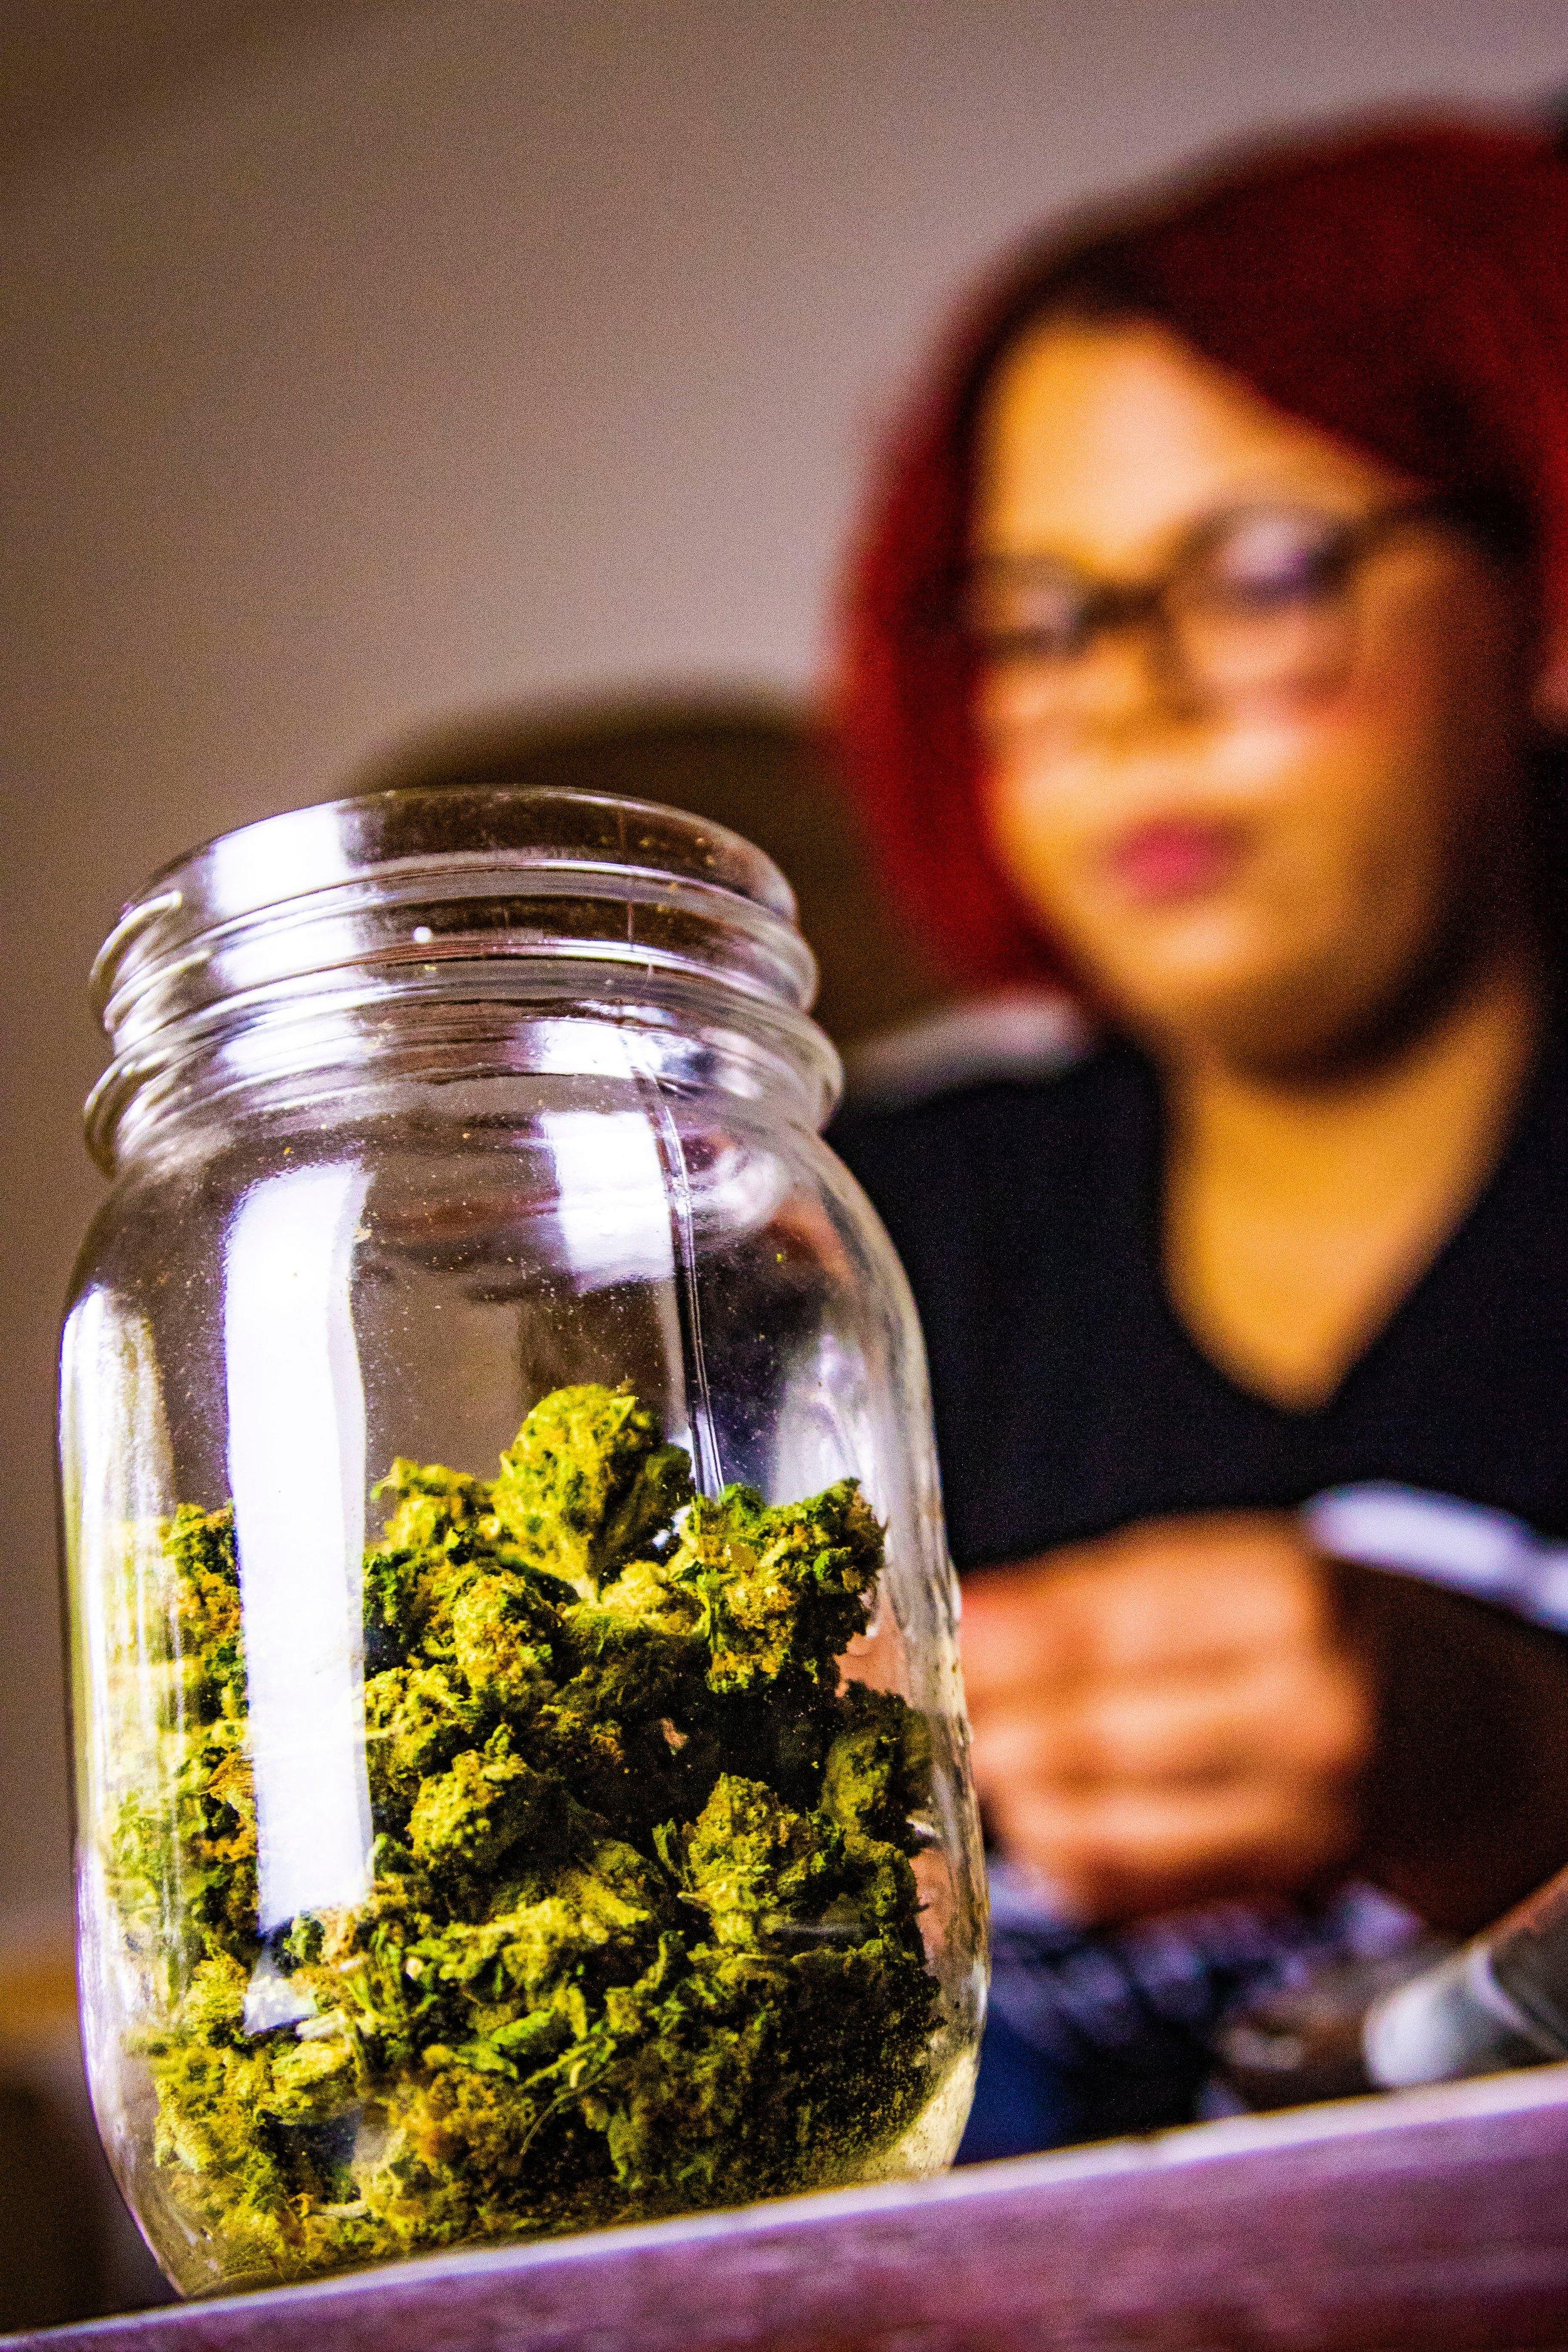 weed stigma